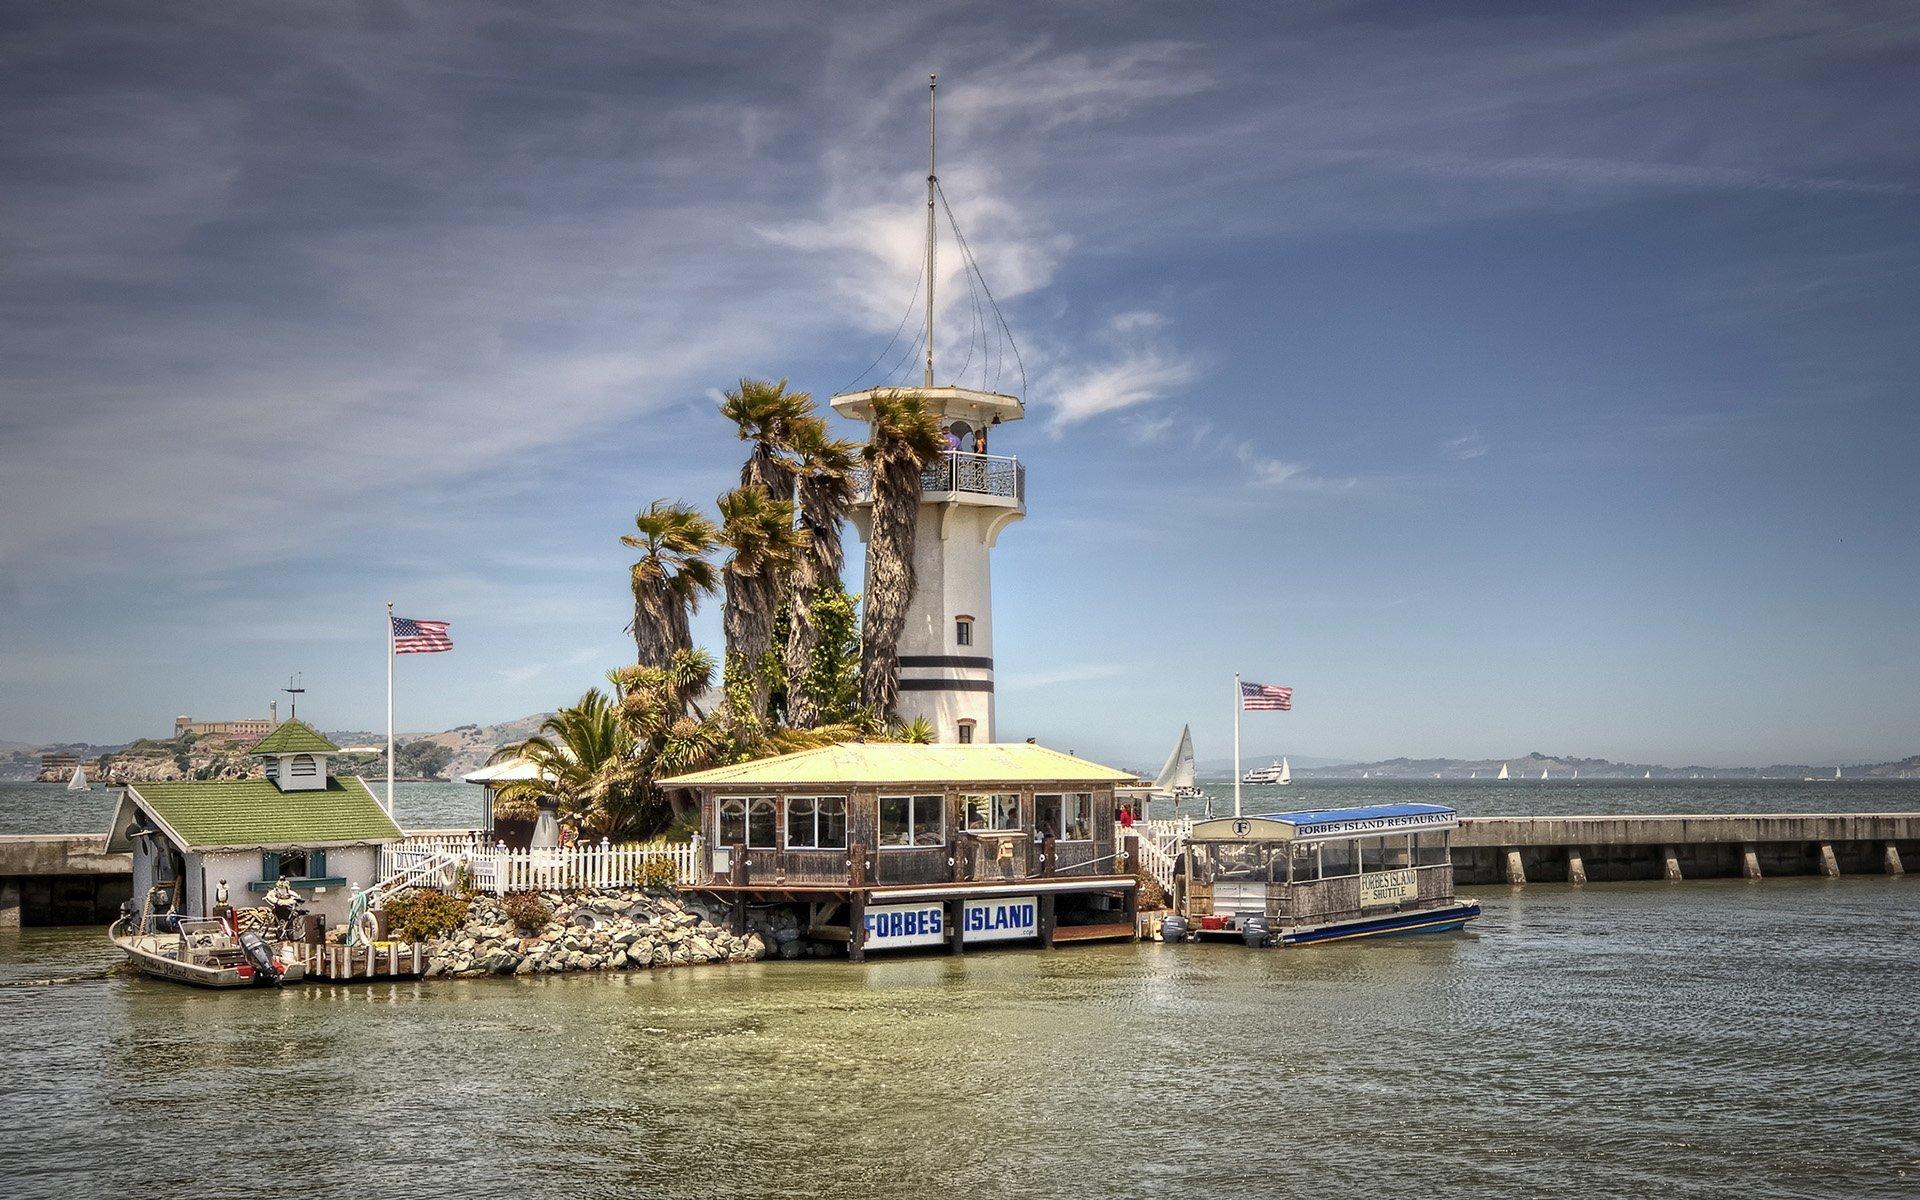 forbes island restaurant